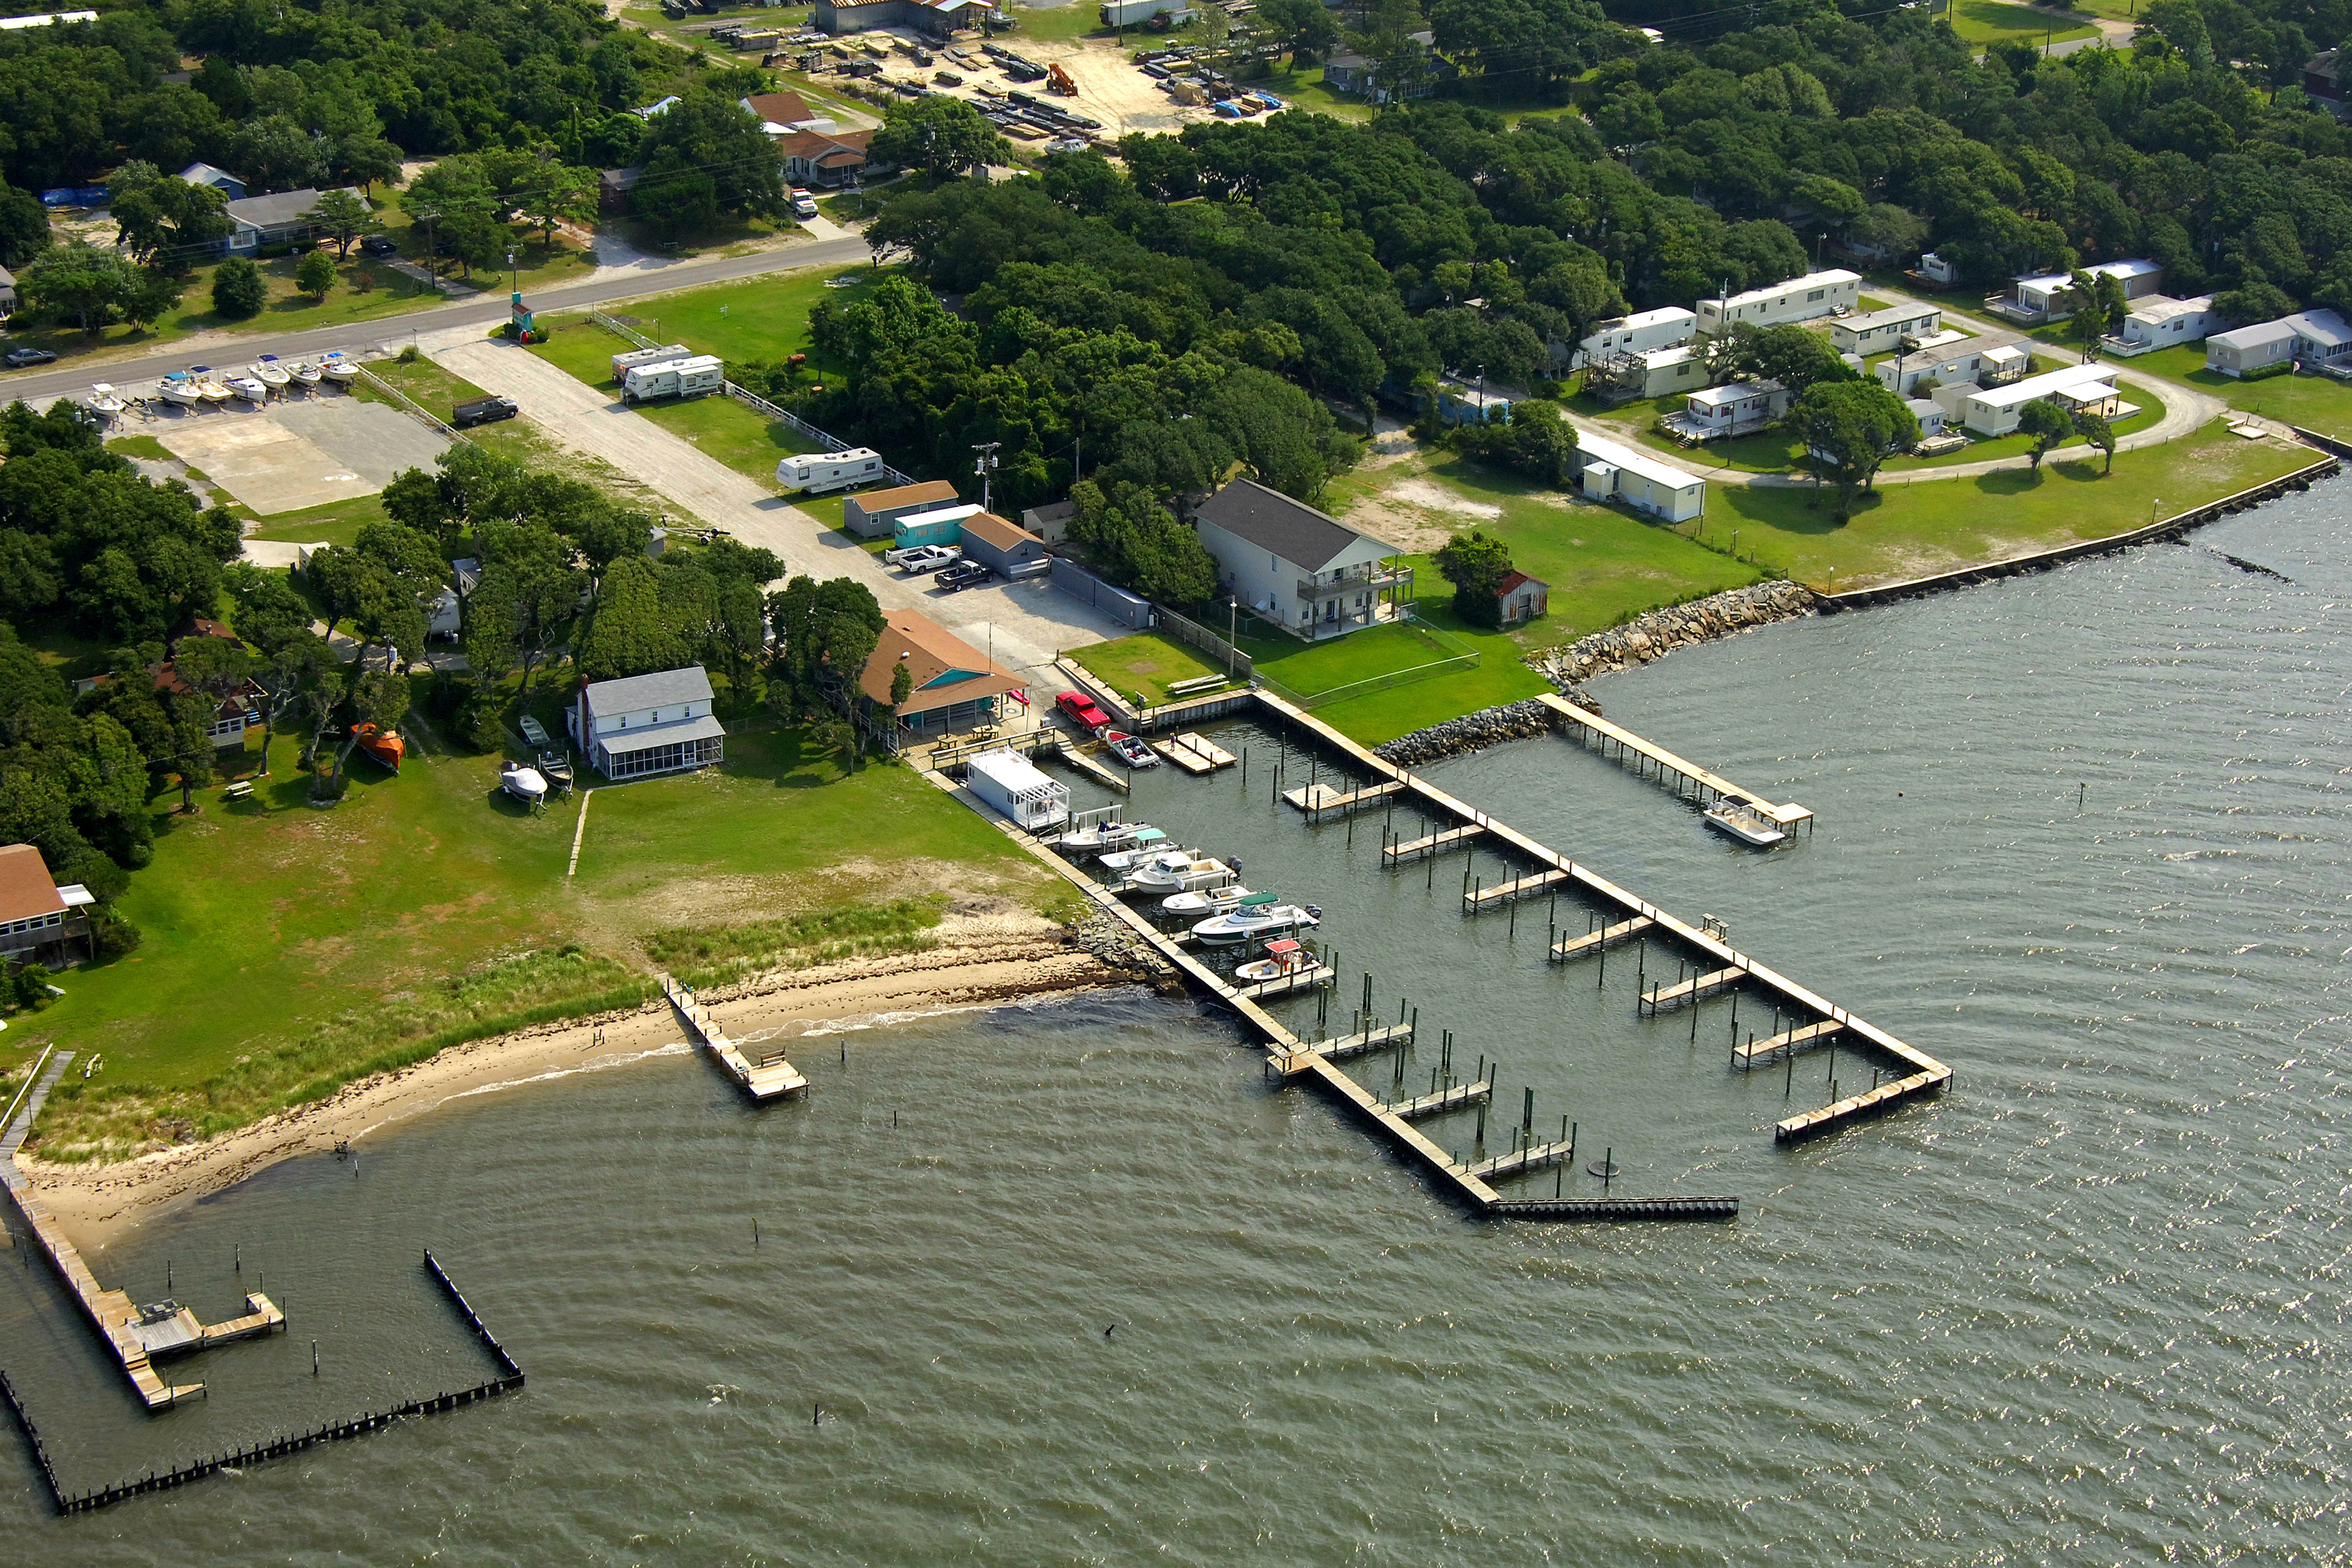 Cape Pointe Marina In Harkers Island Nc United States Marina Reviews Phone Number Marinas Com